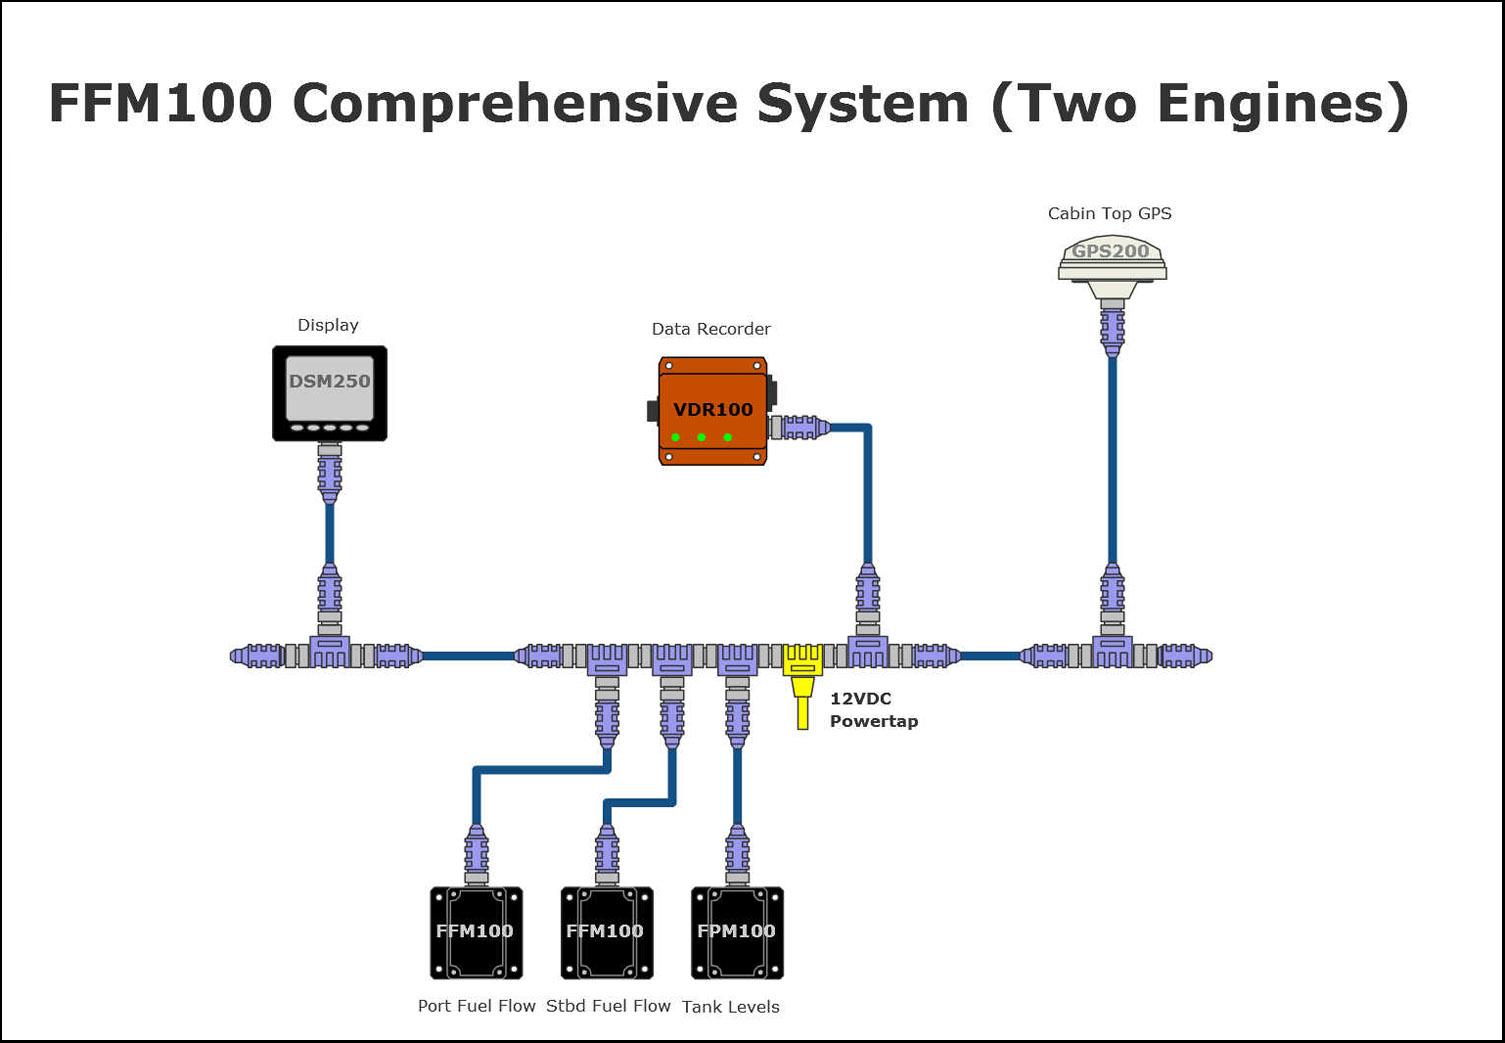 Garmin 5212 Chartplotter Marine Wiring Diagram Diagrams Gps 2006c Radio Nmea 2000 Color Code Chart